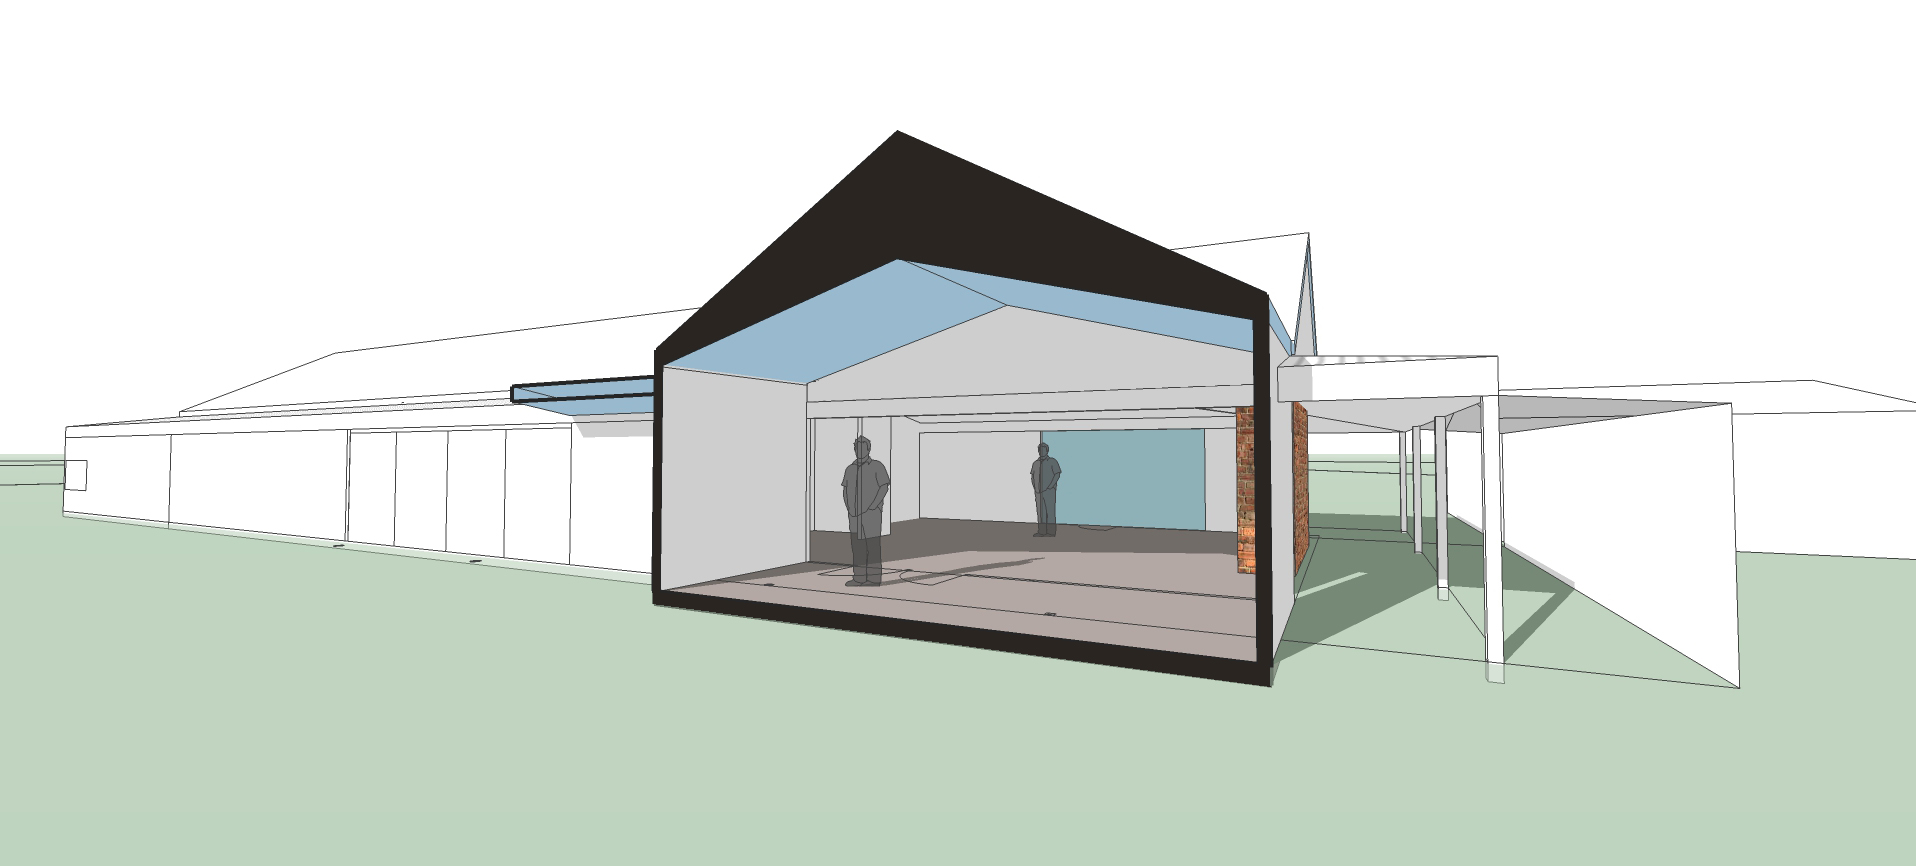 Haddon Strawbale: Rendered strawbale addition and retrofit, airtight passive house principles, solar heating.